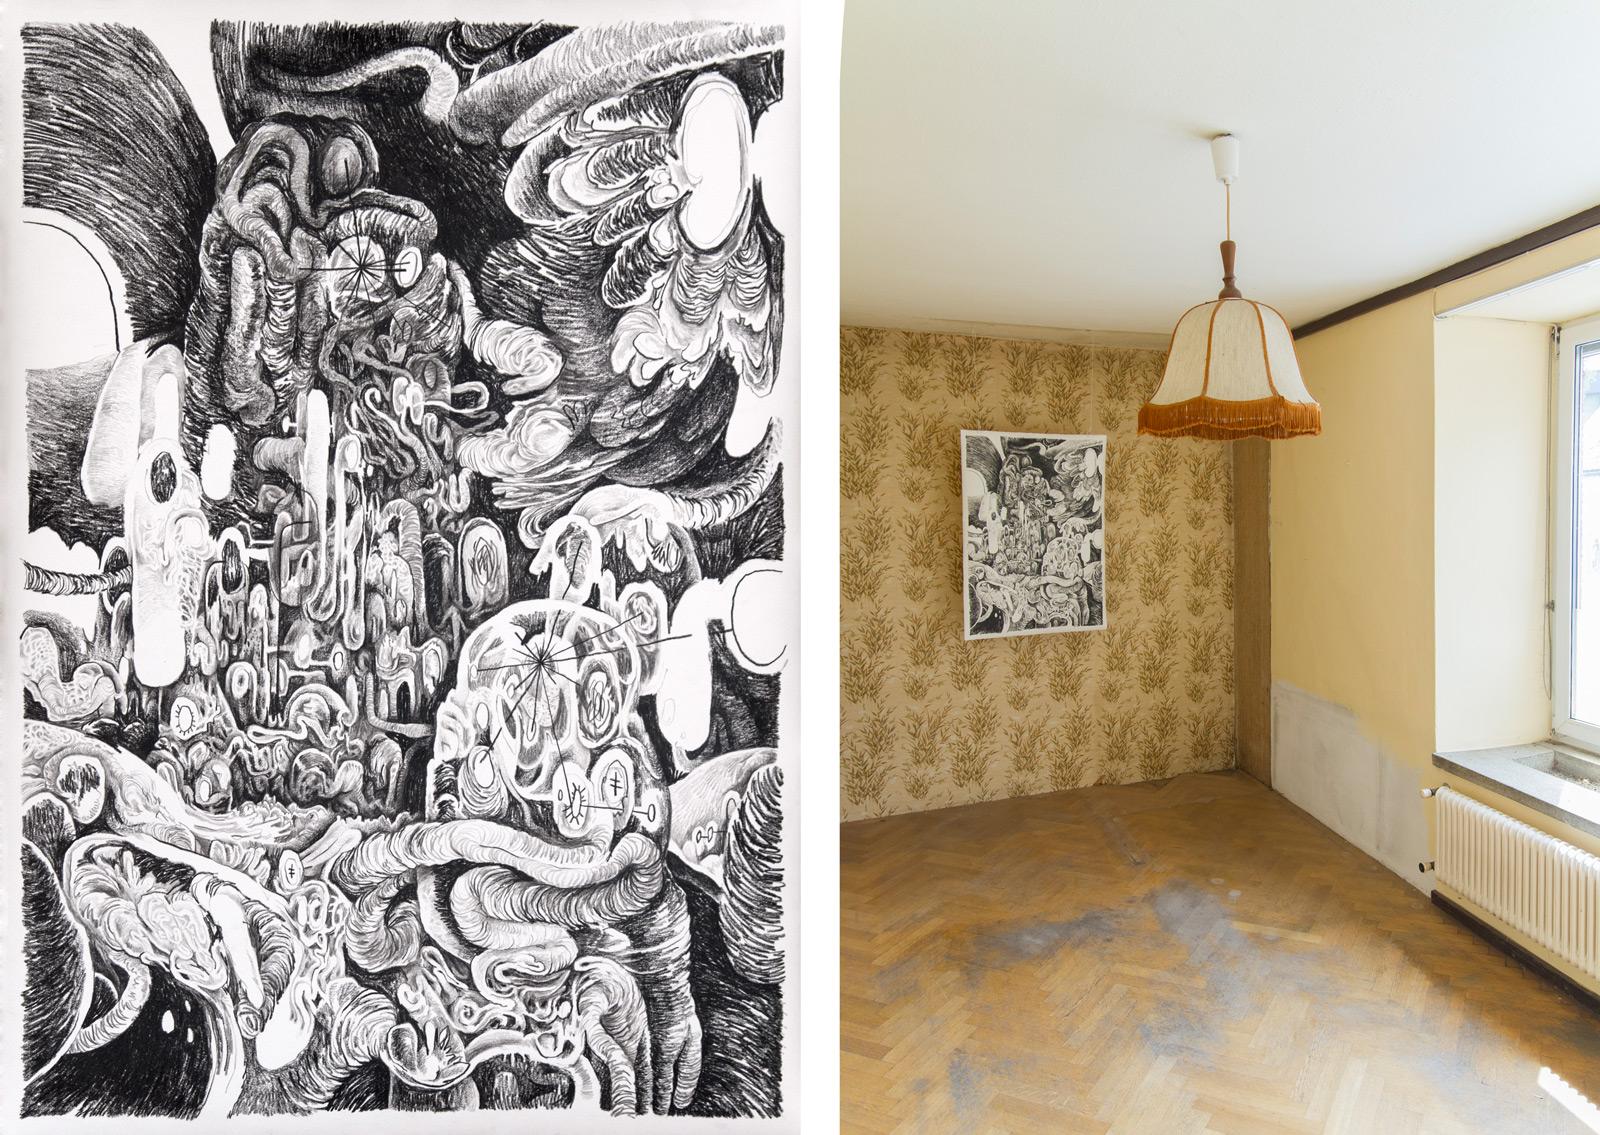 A Life V, 2014 | Crayon on paper | 76 x 108 cm